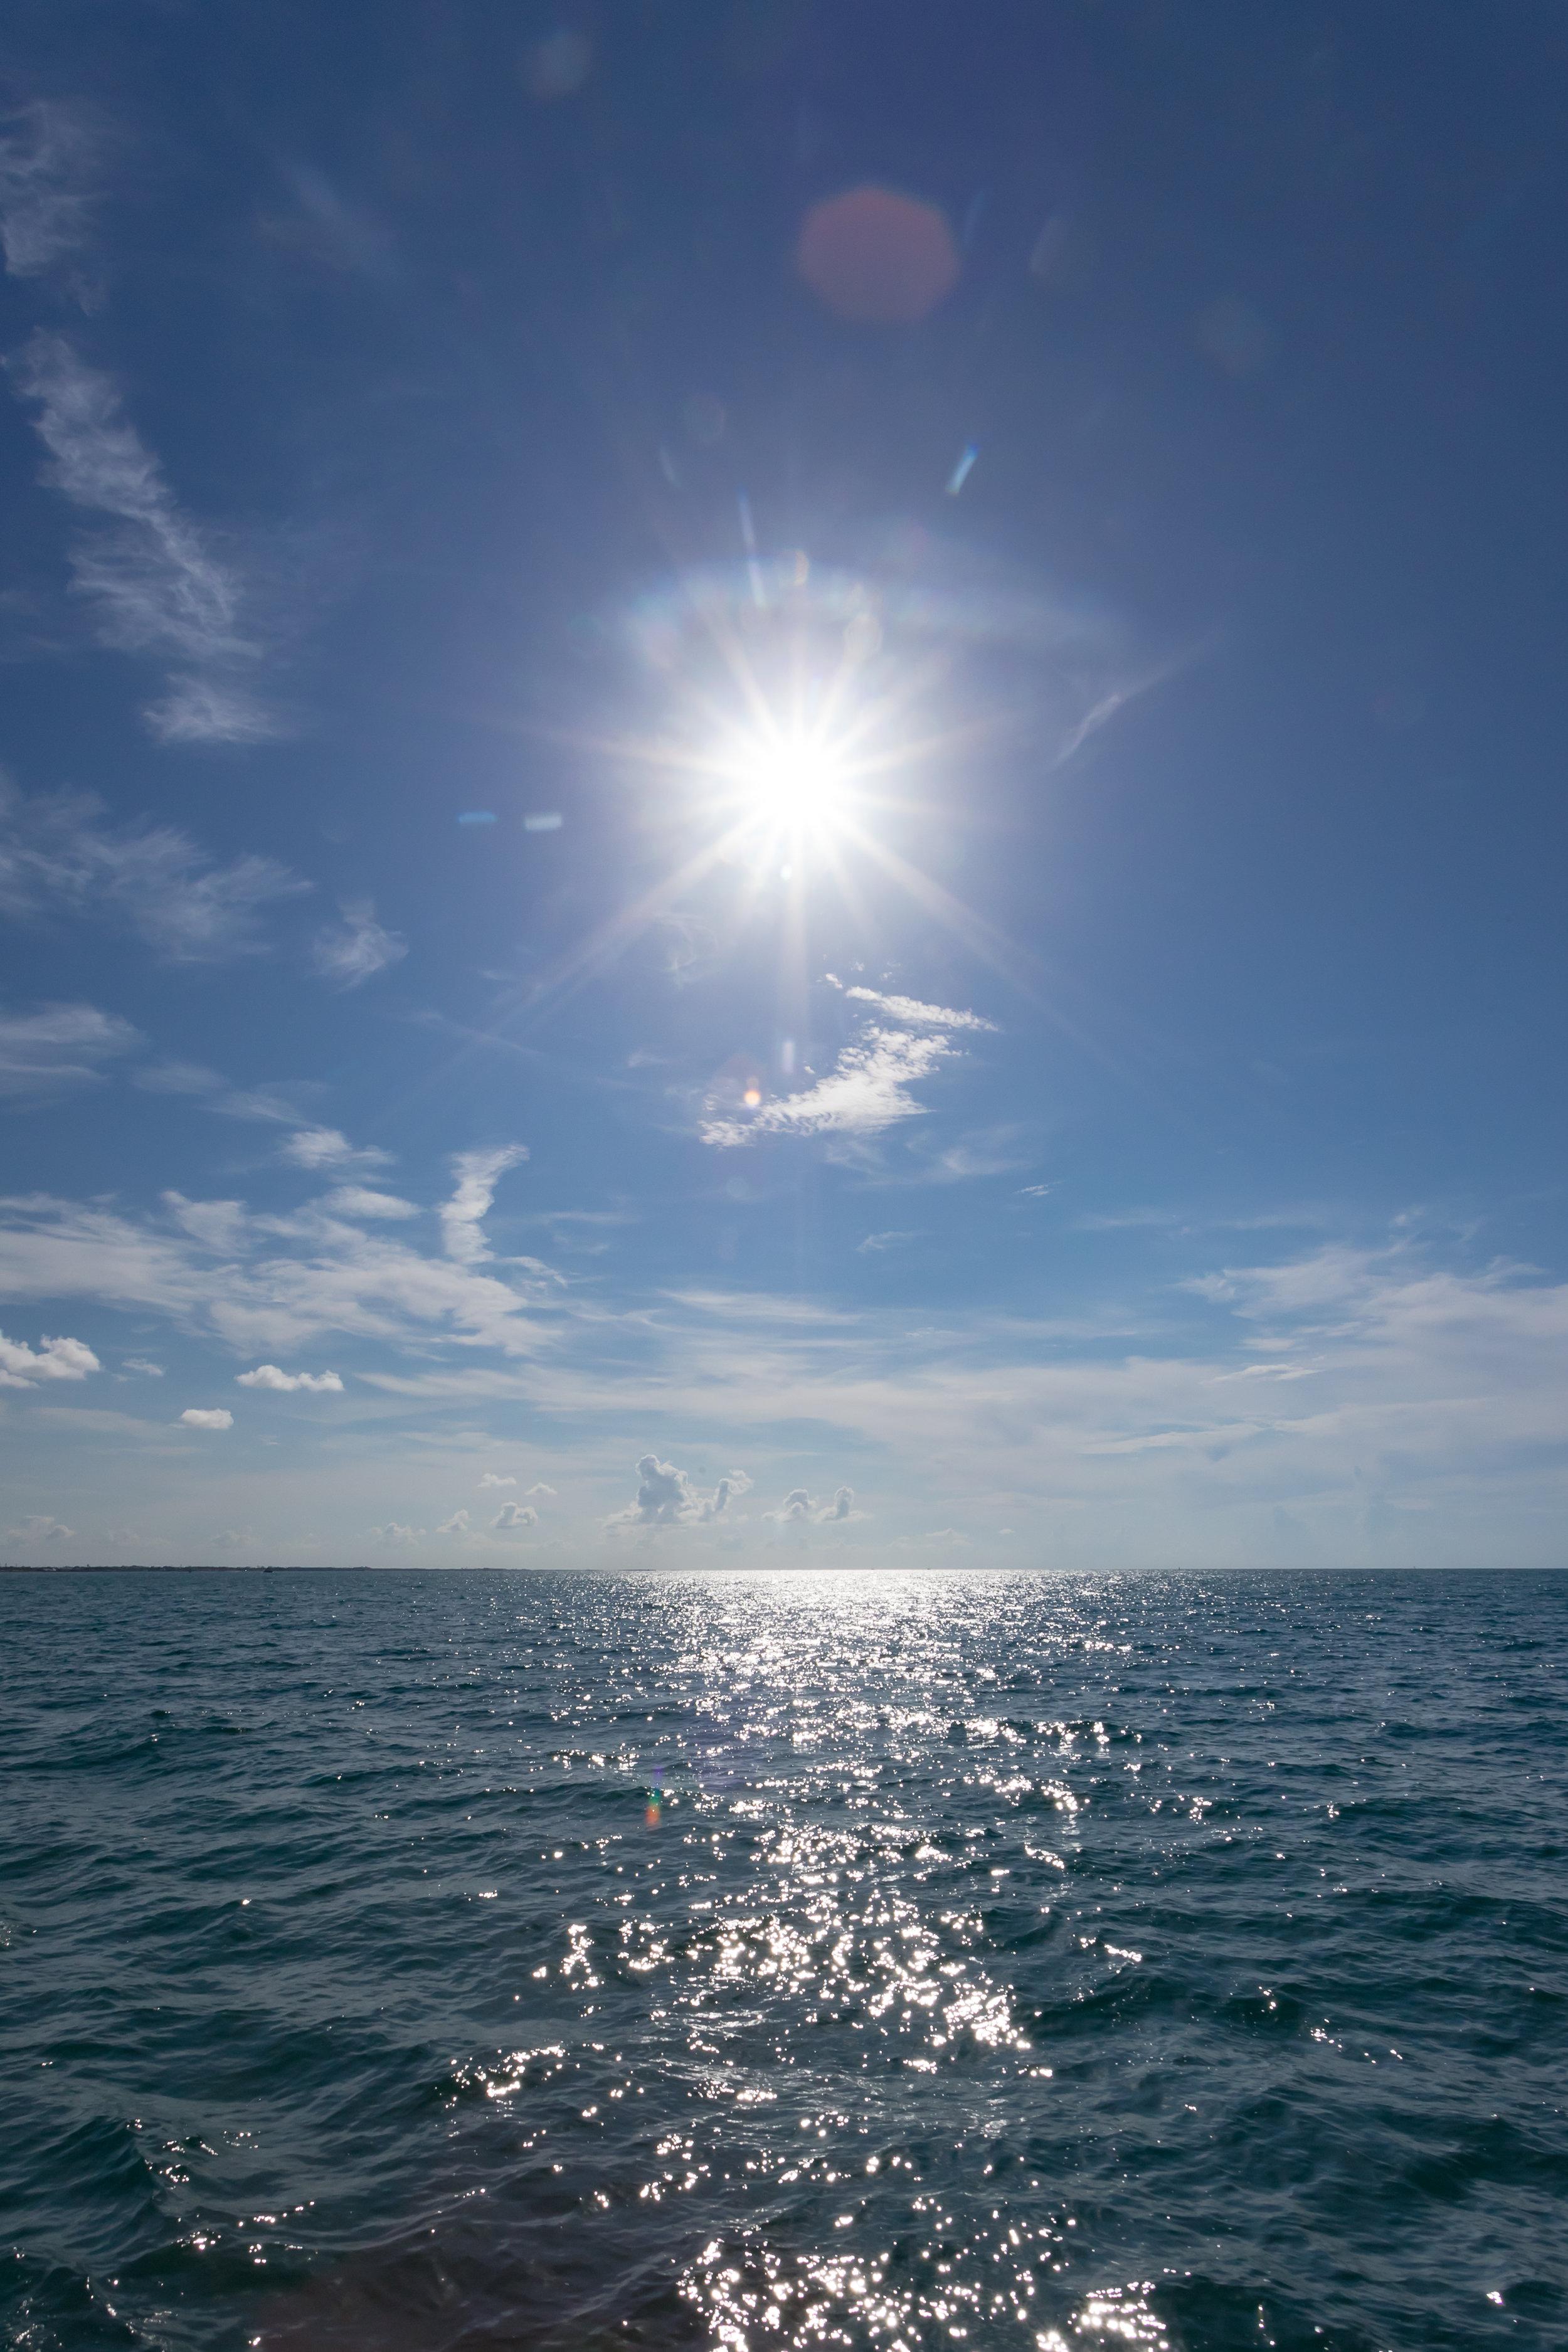 july 6, 2018  atlantic ocean - key west, florida